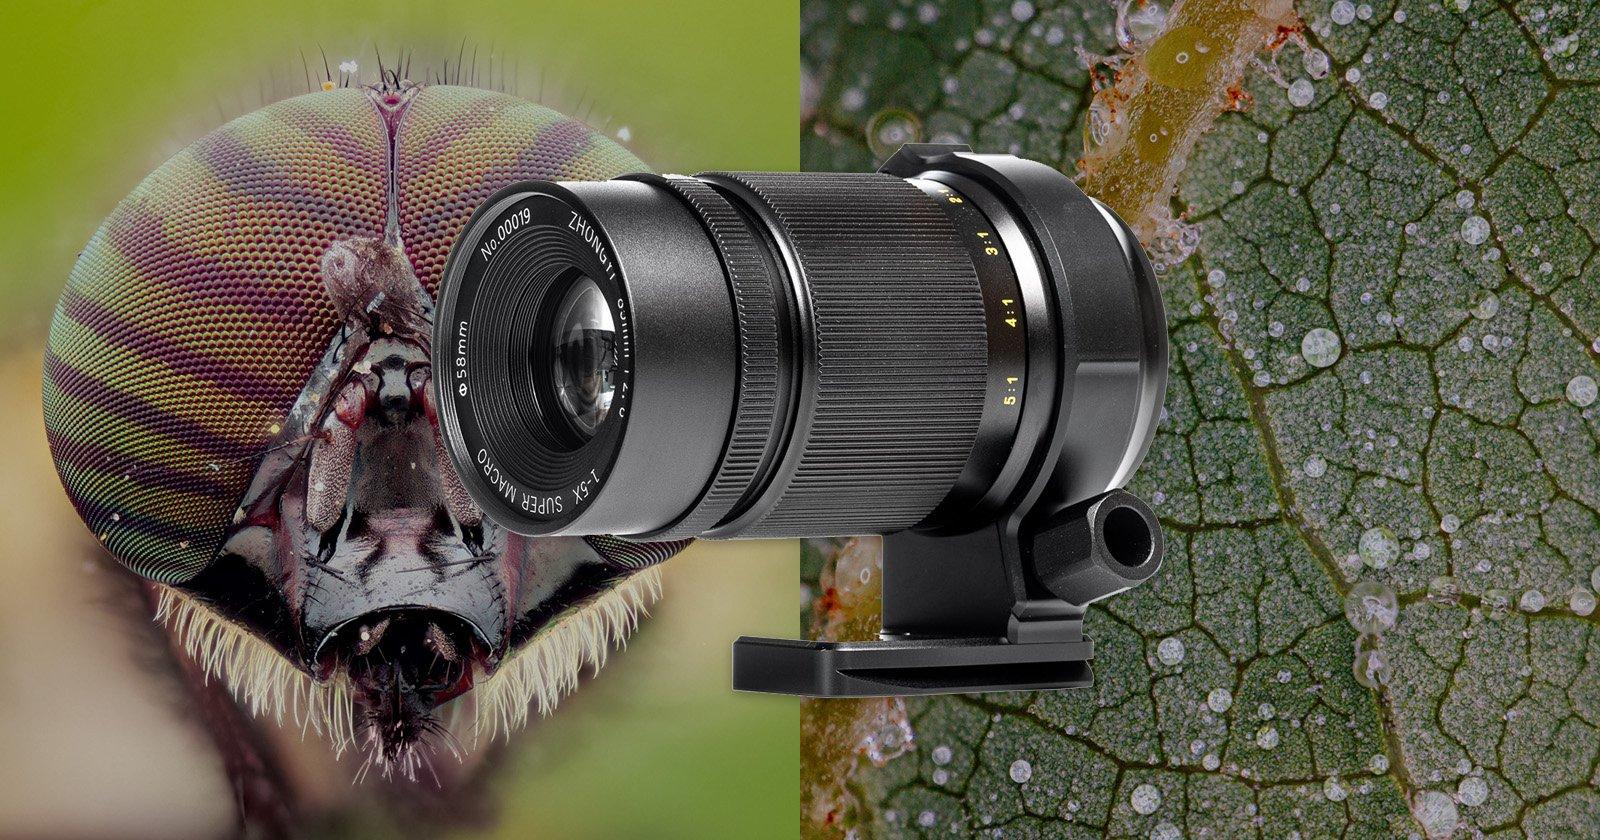 ZY Optics Unveils Mitakon 85mm f/2.8 1-5x Super Macro Lens